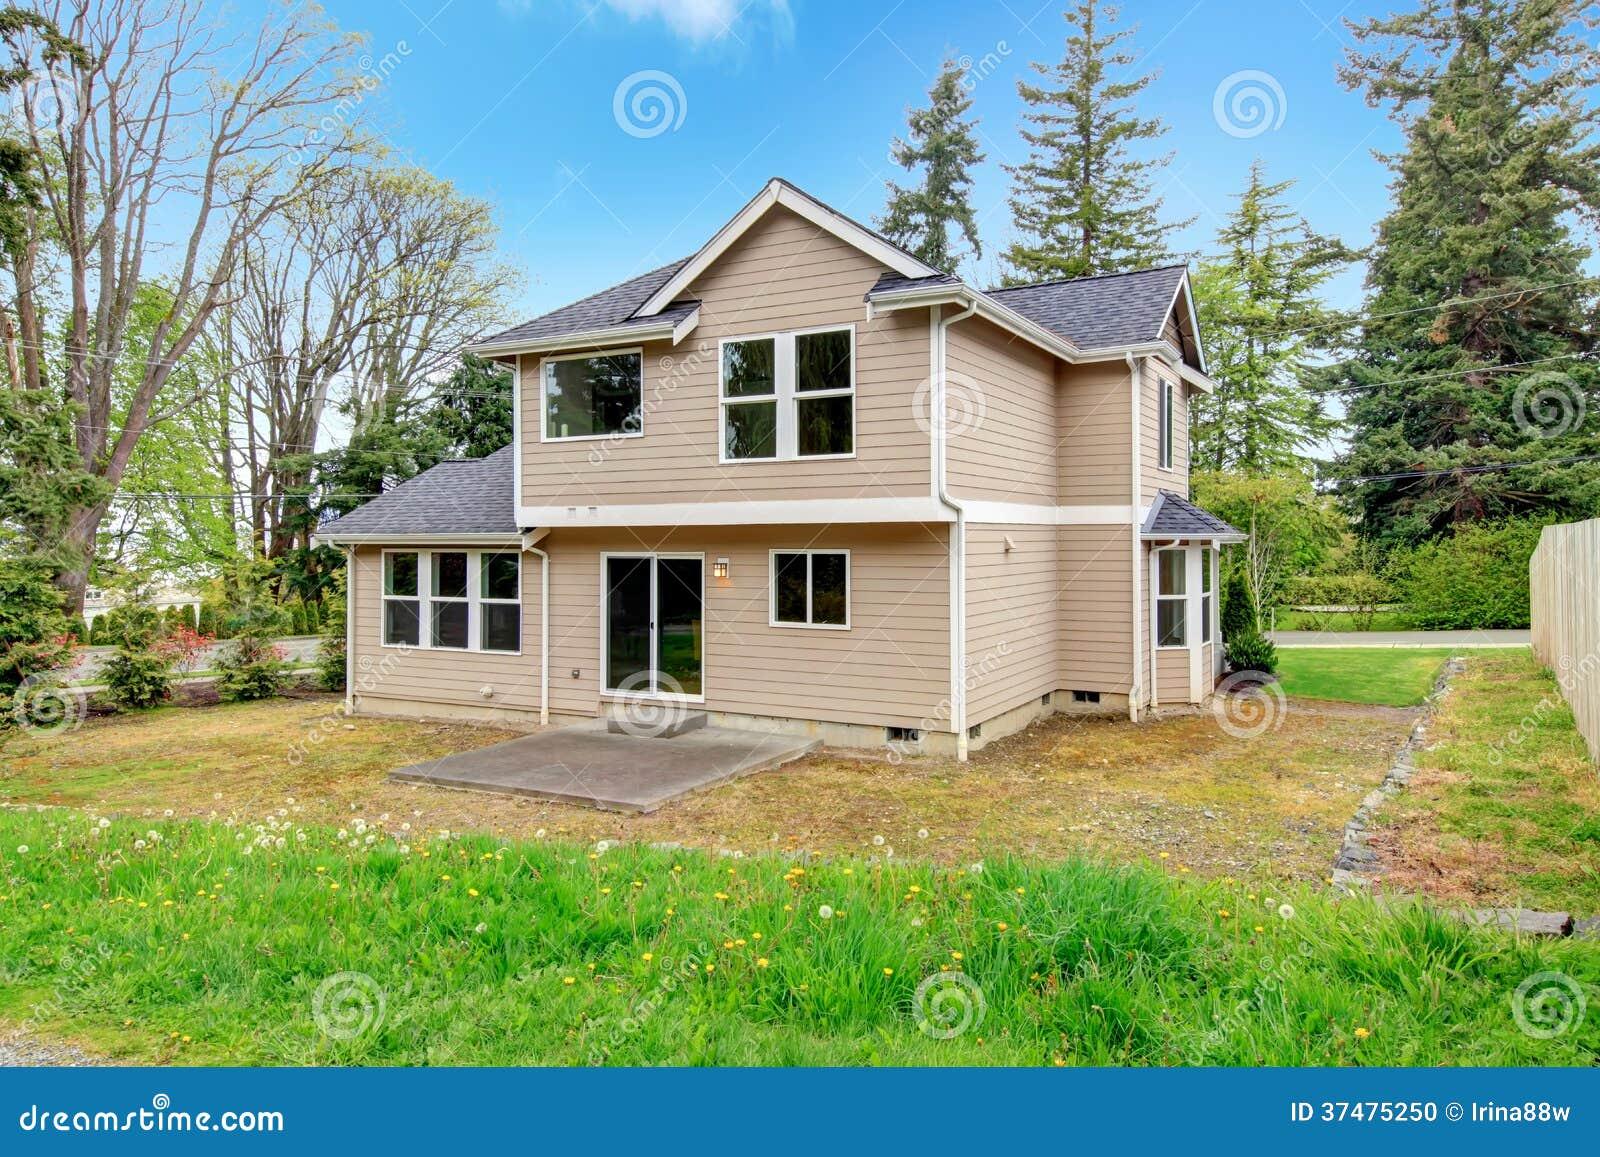 Open Backyard With Concrete Porch Stock Photo Image